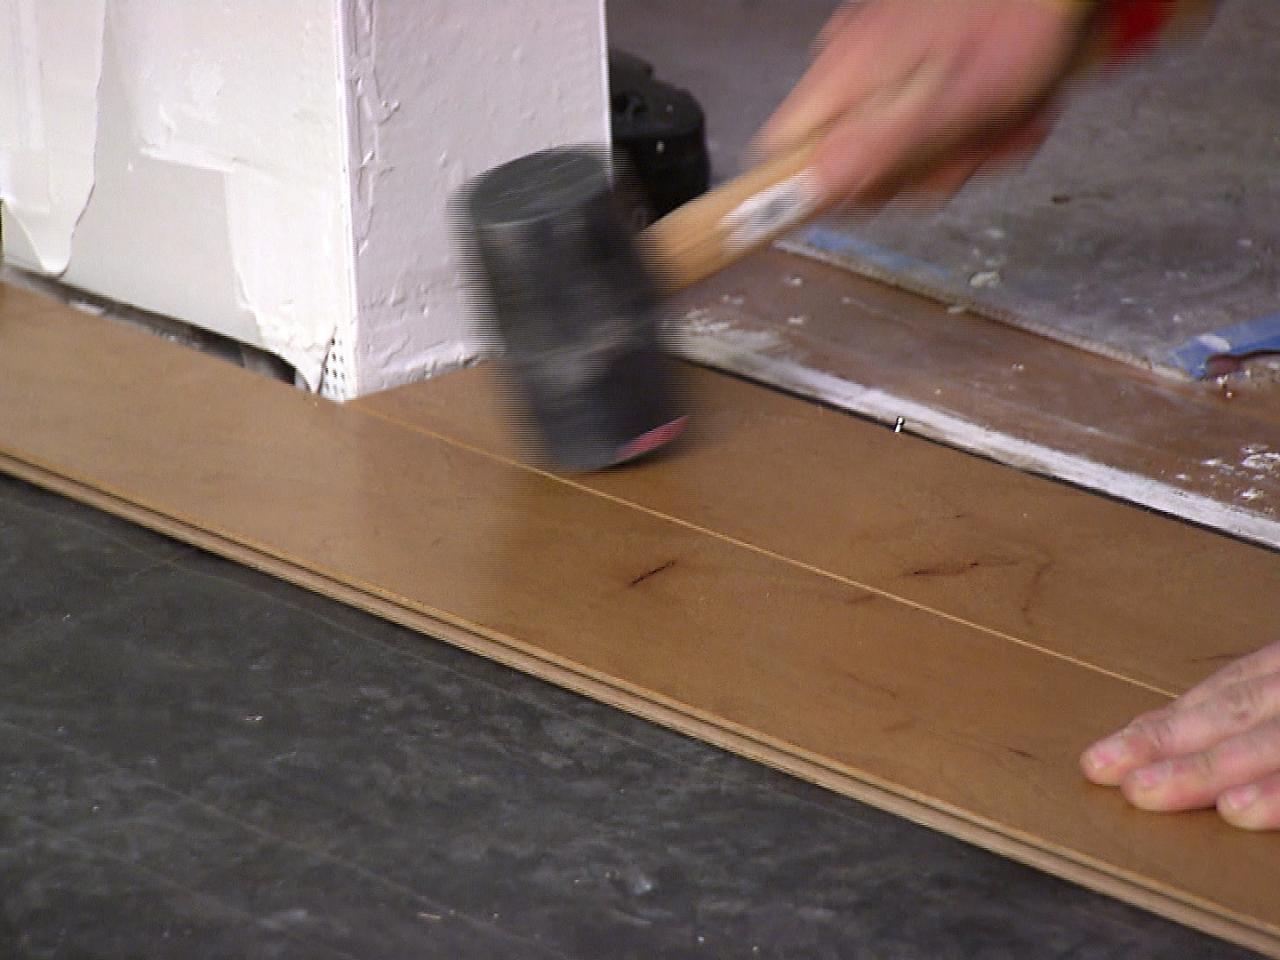 Diy hardwood floor dkim112_engineered-hardwood-floor-install_s4x3 MTNXNXD